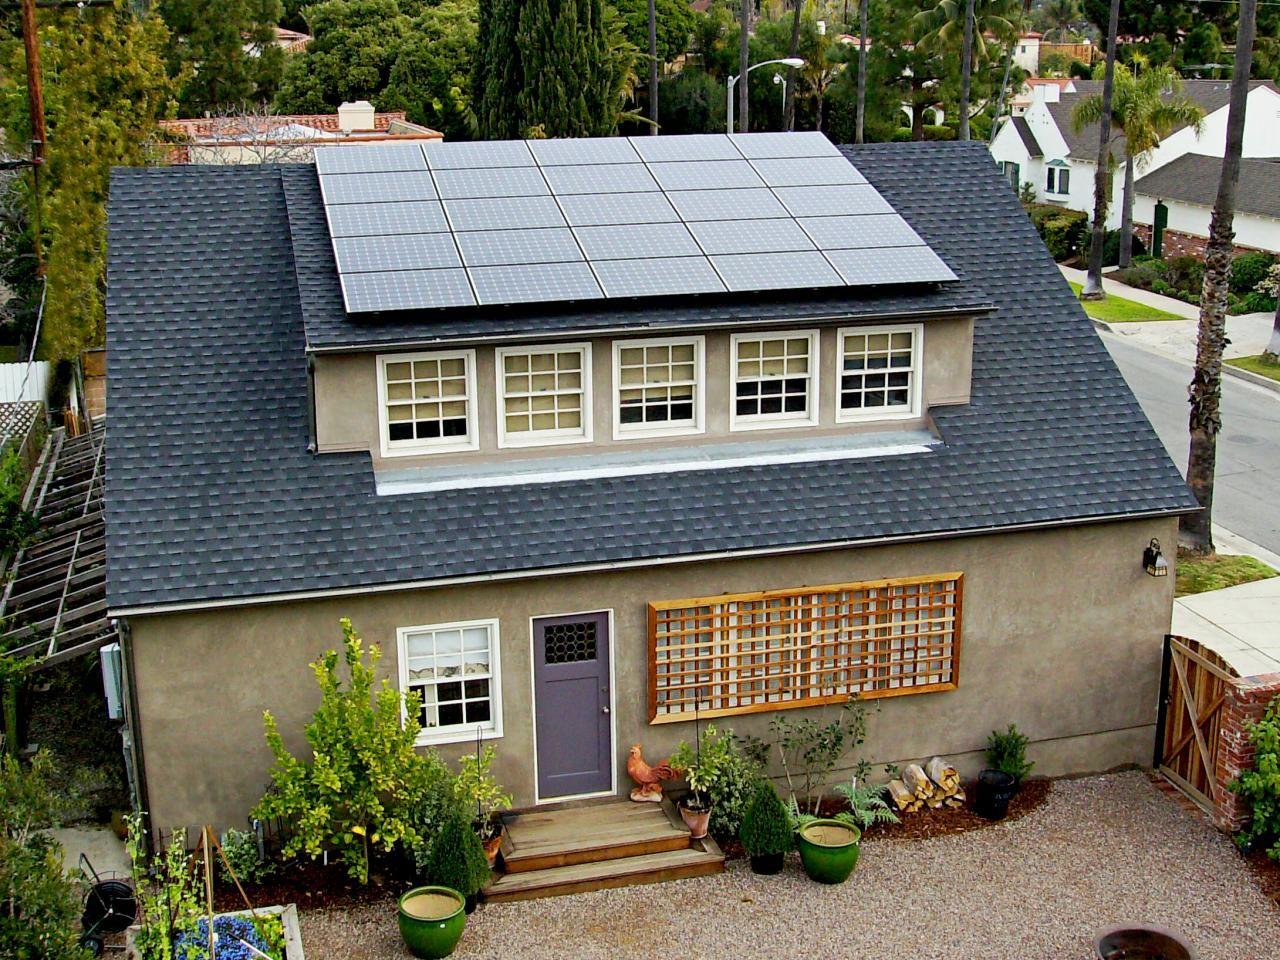 Image Result For Solar Panels On Dormer Roof Solar Panels Roof Dormer Roof Solar Panels